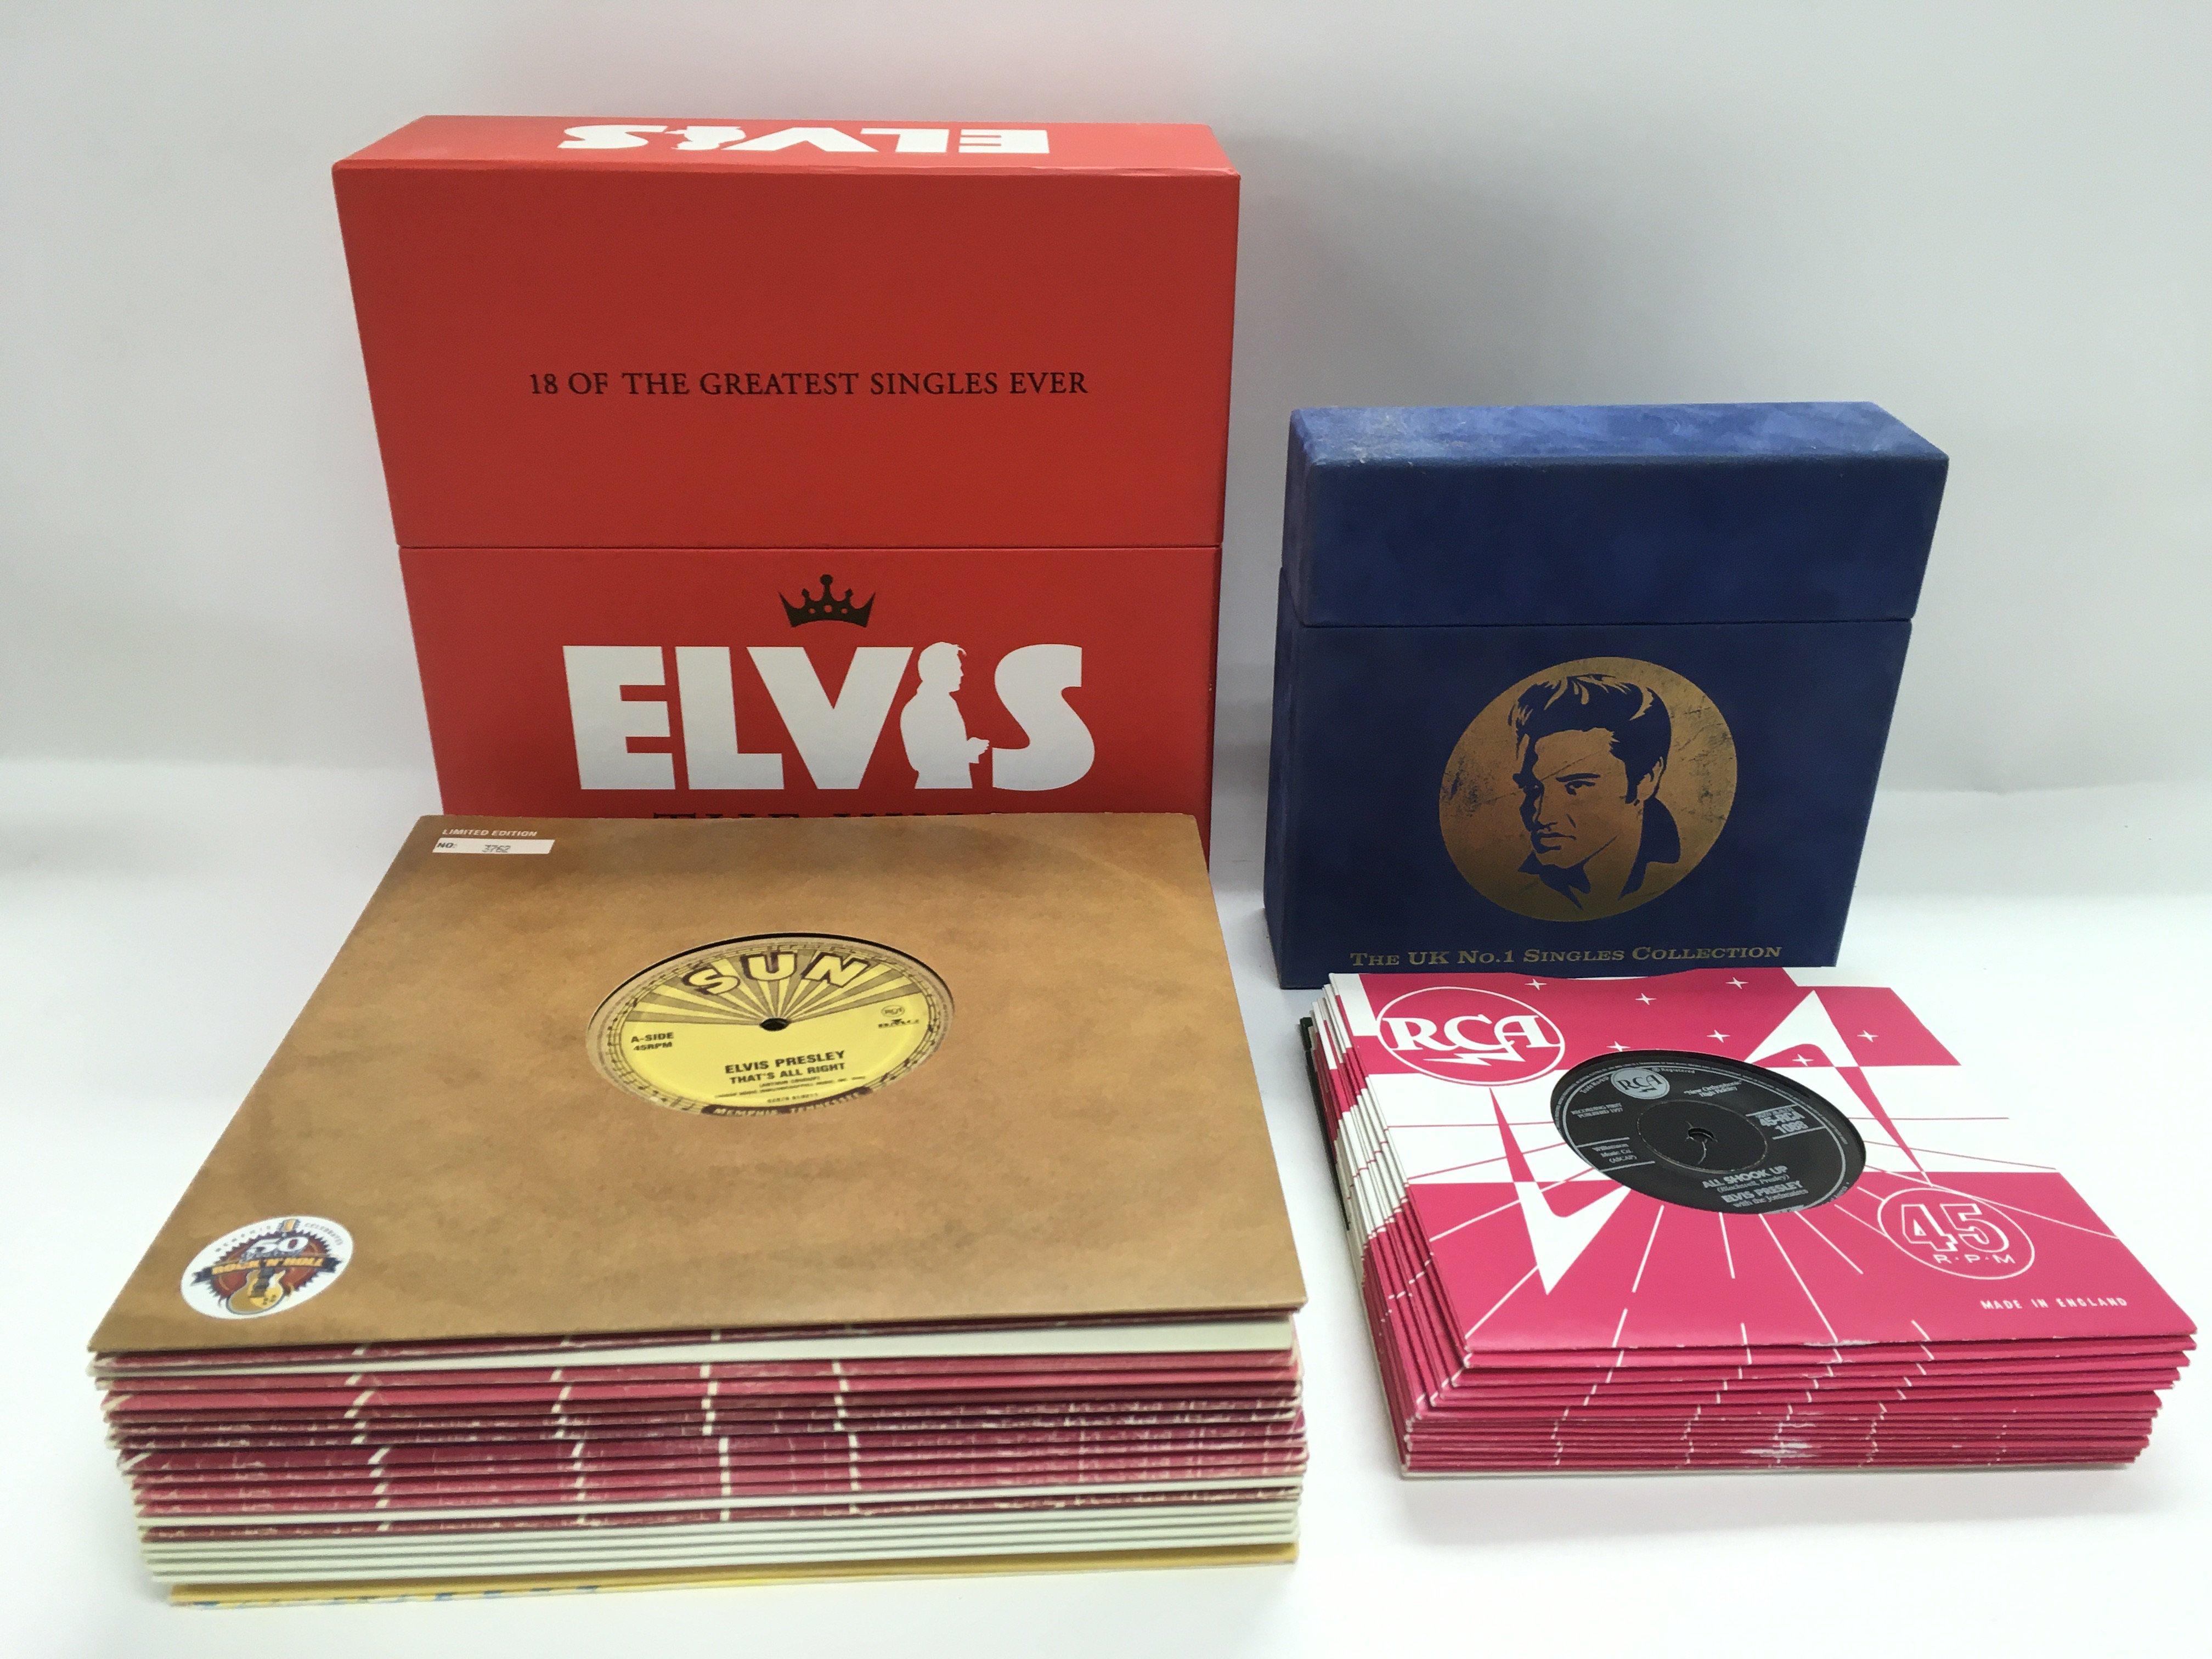 Two Elvis Presley singles box sets comprising a li